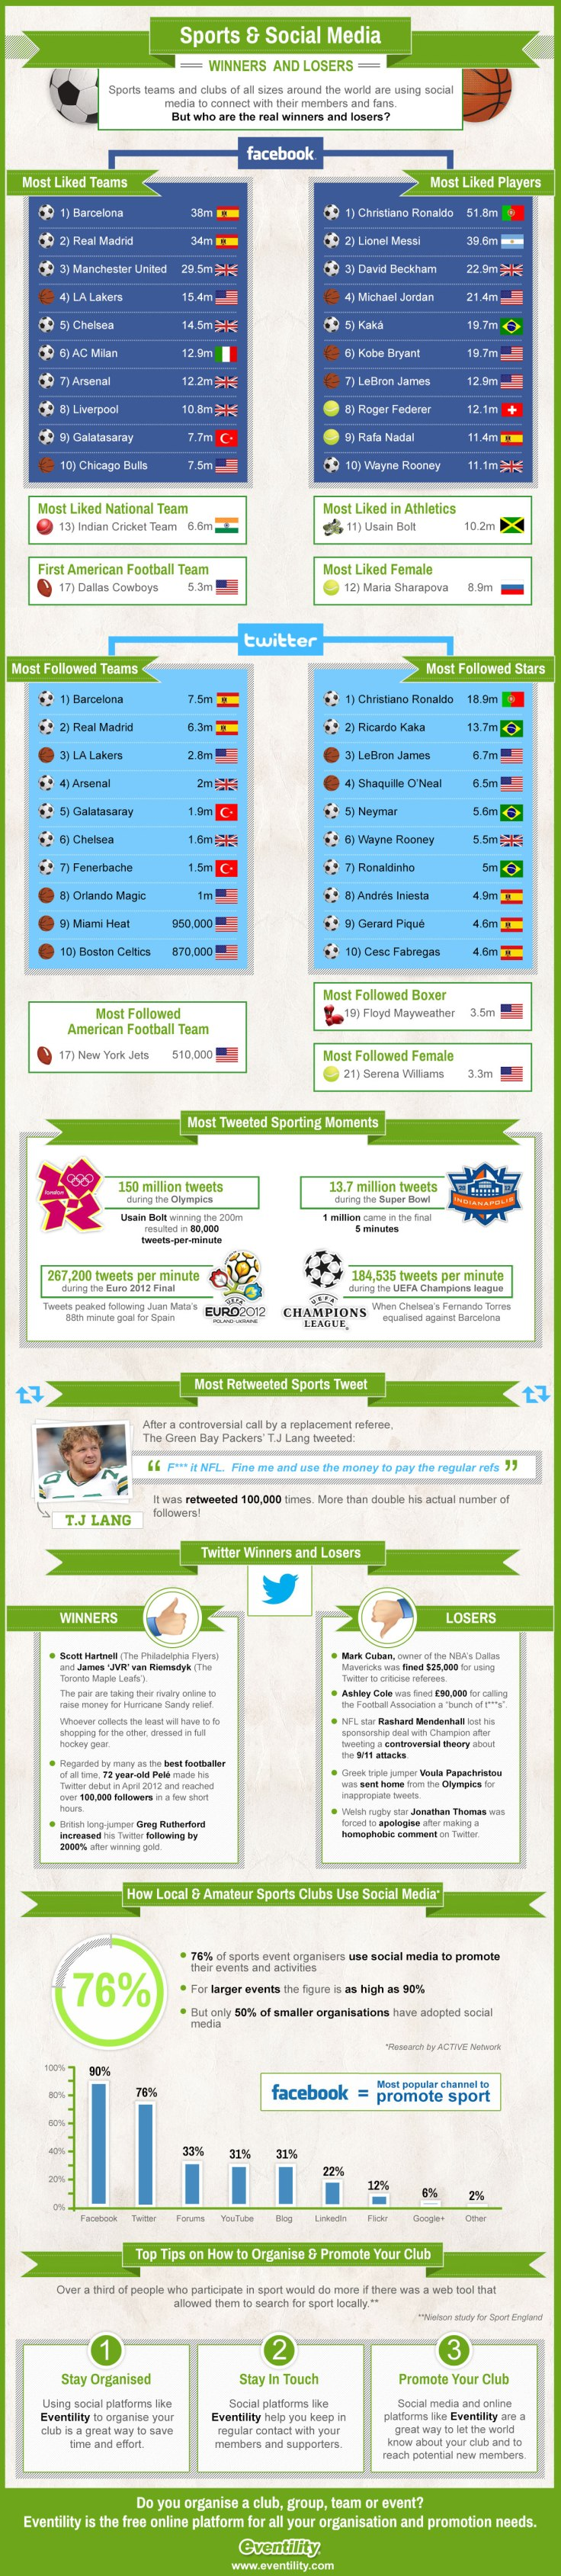 sports_and_socialmedia